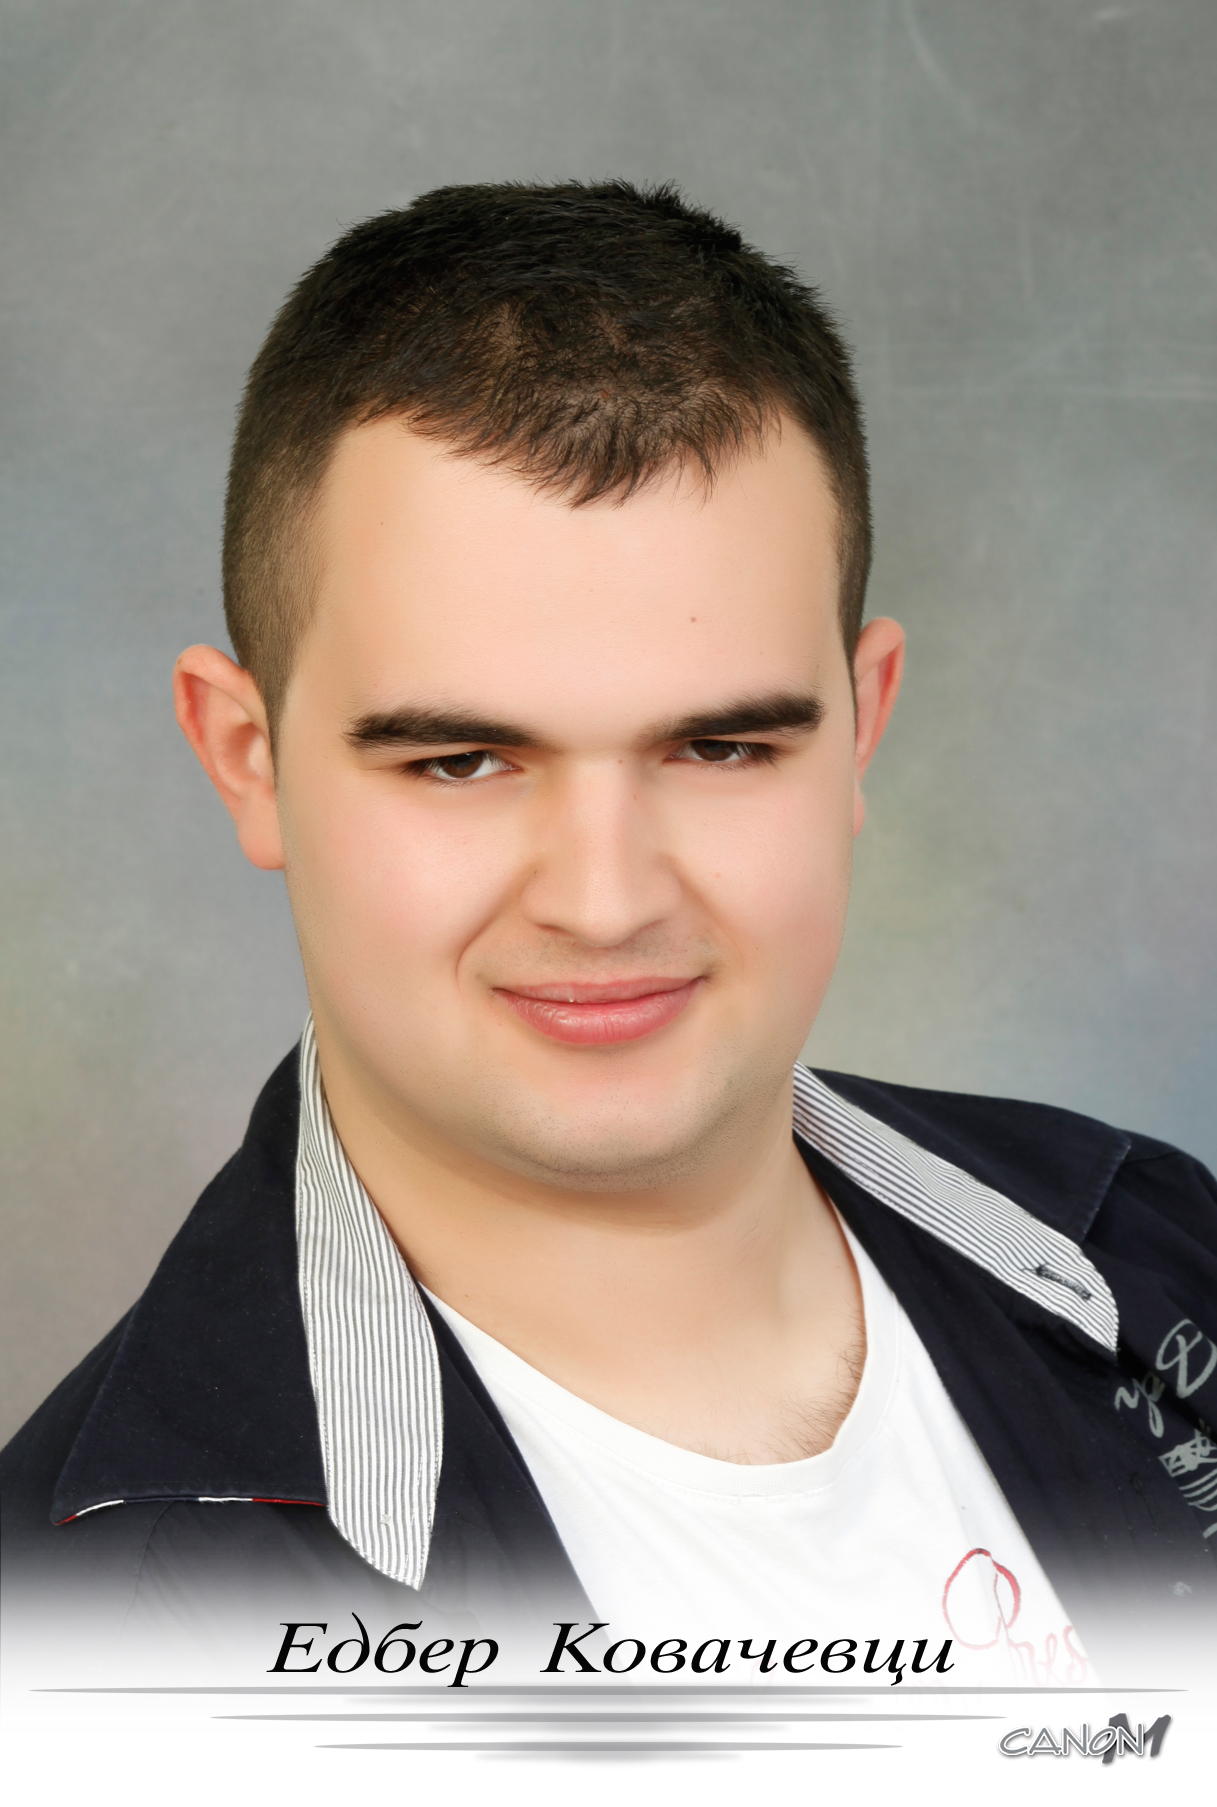 kovacevci-edber